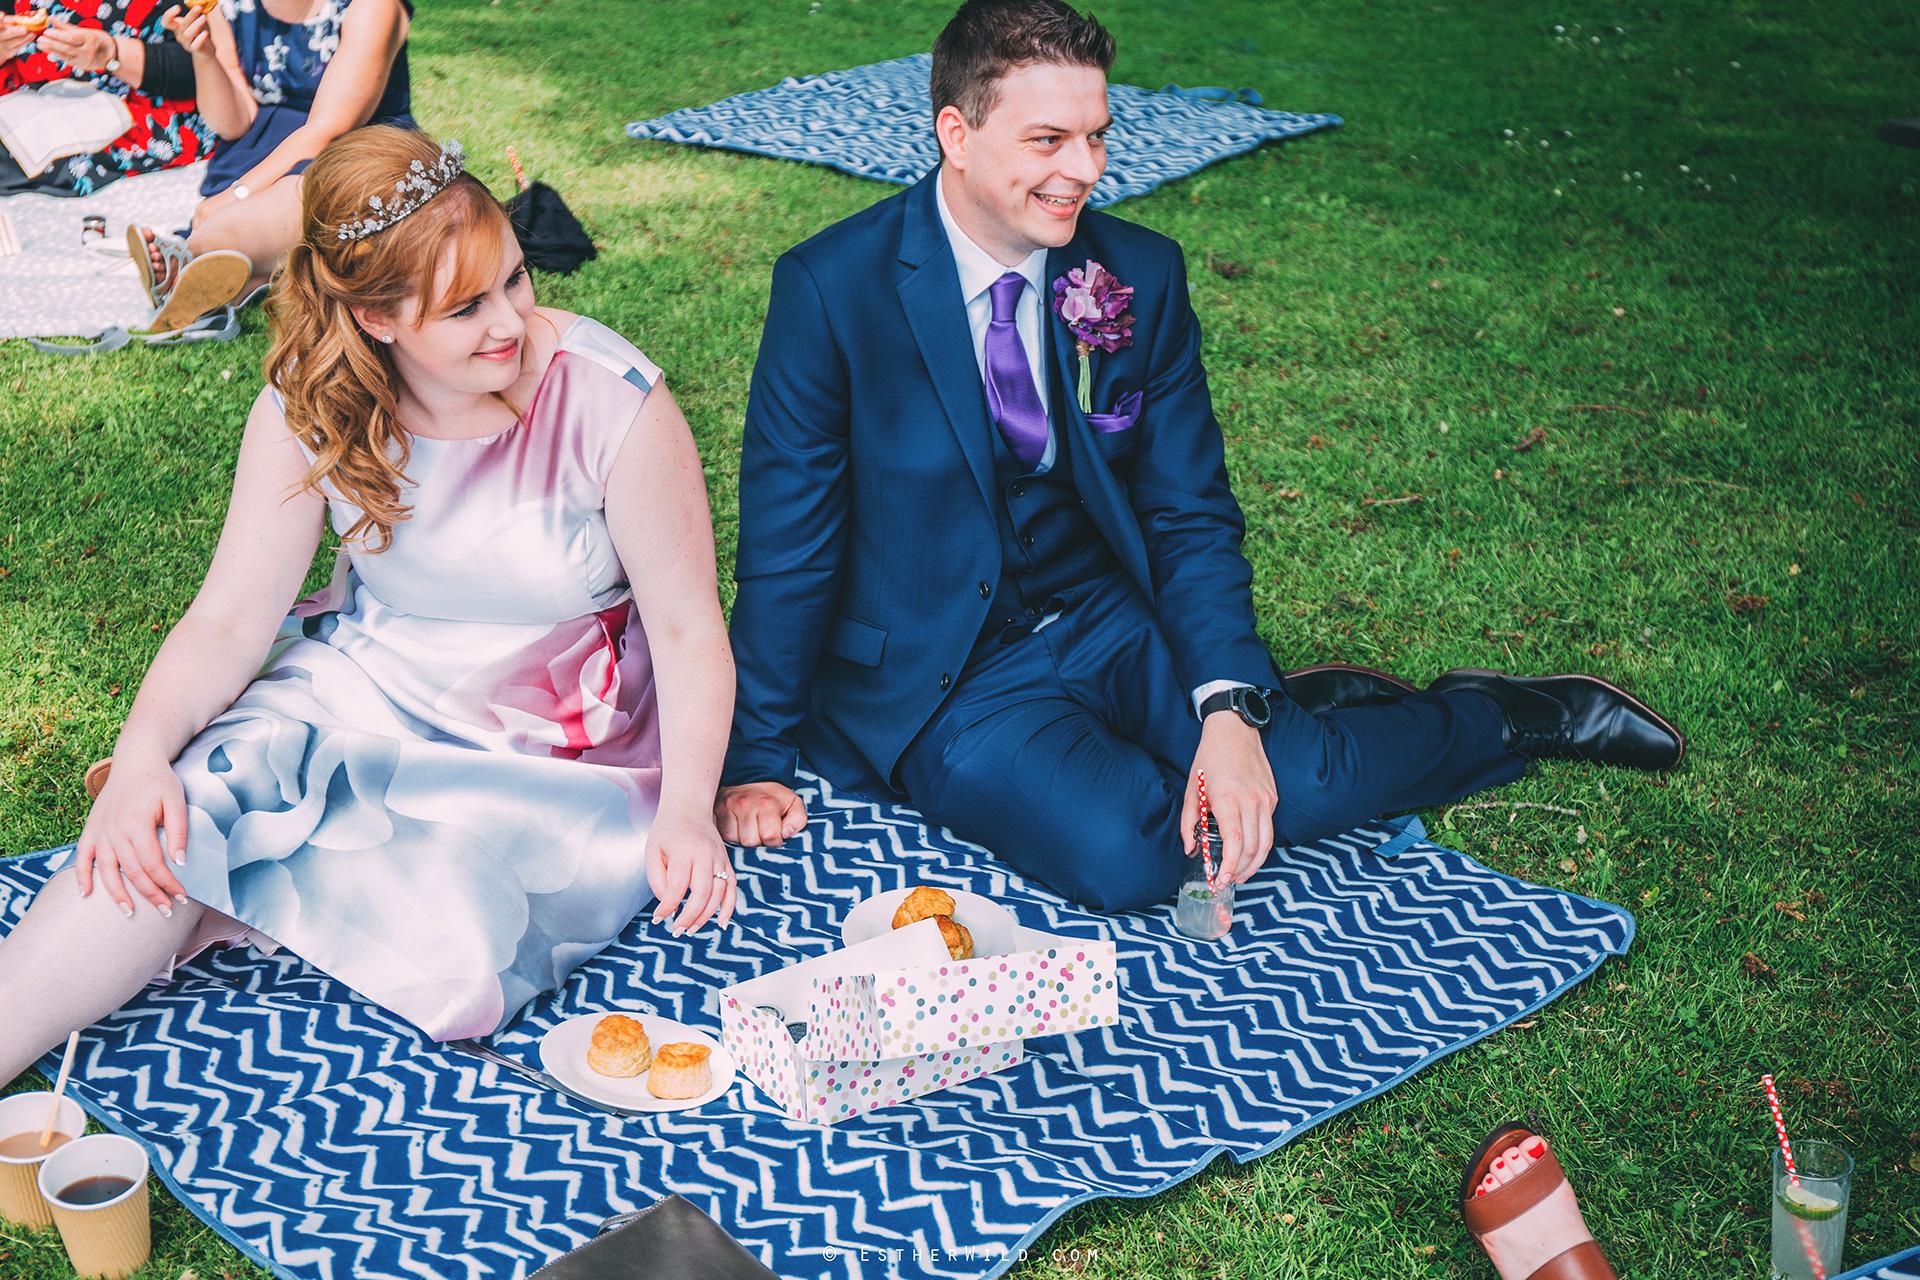 Norfolk_Wedding_Photographer_Mannington_Hall_Country_Esther_Wild_0473.jpg